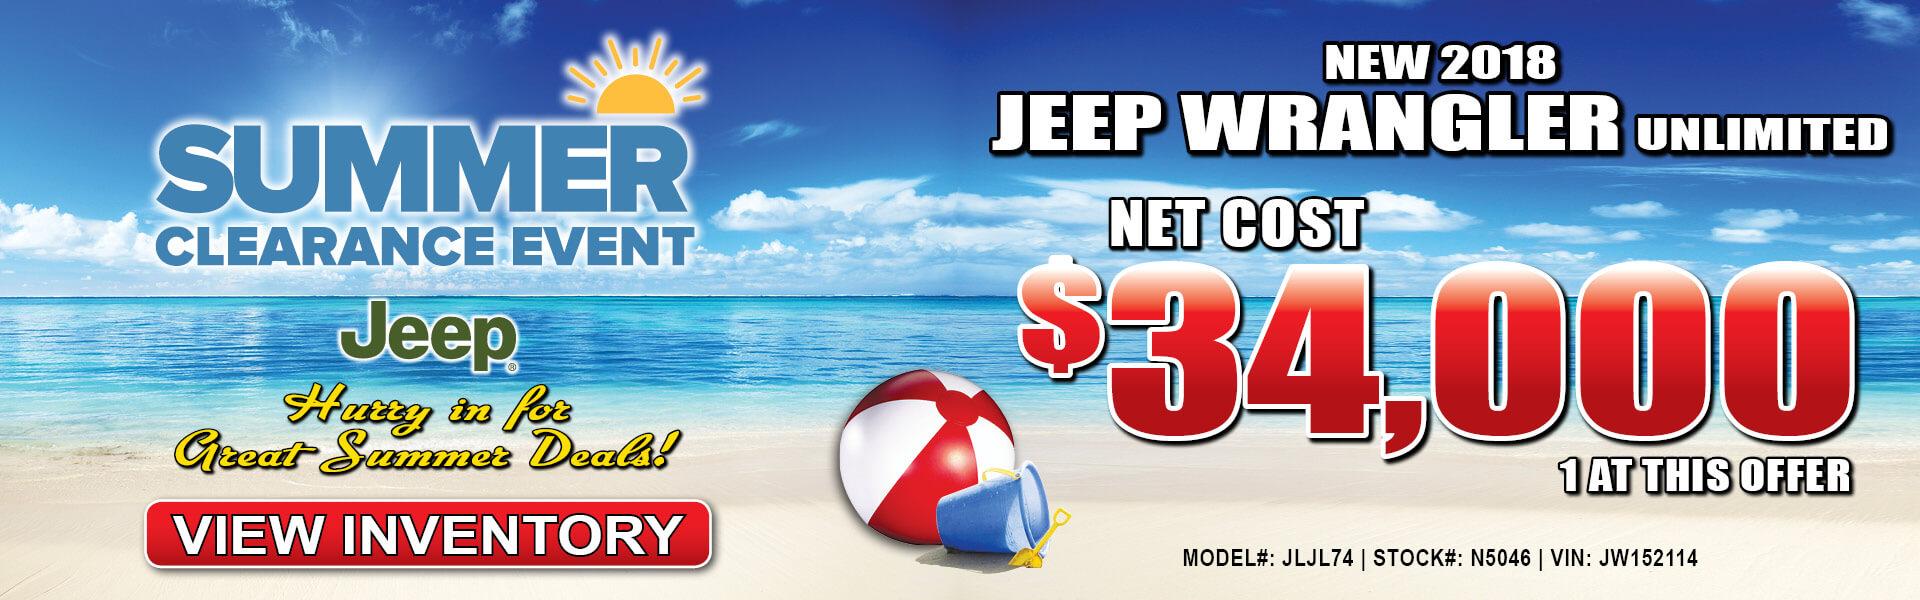 Jeep Wrangler JK $34,000